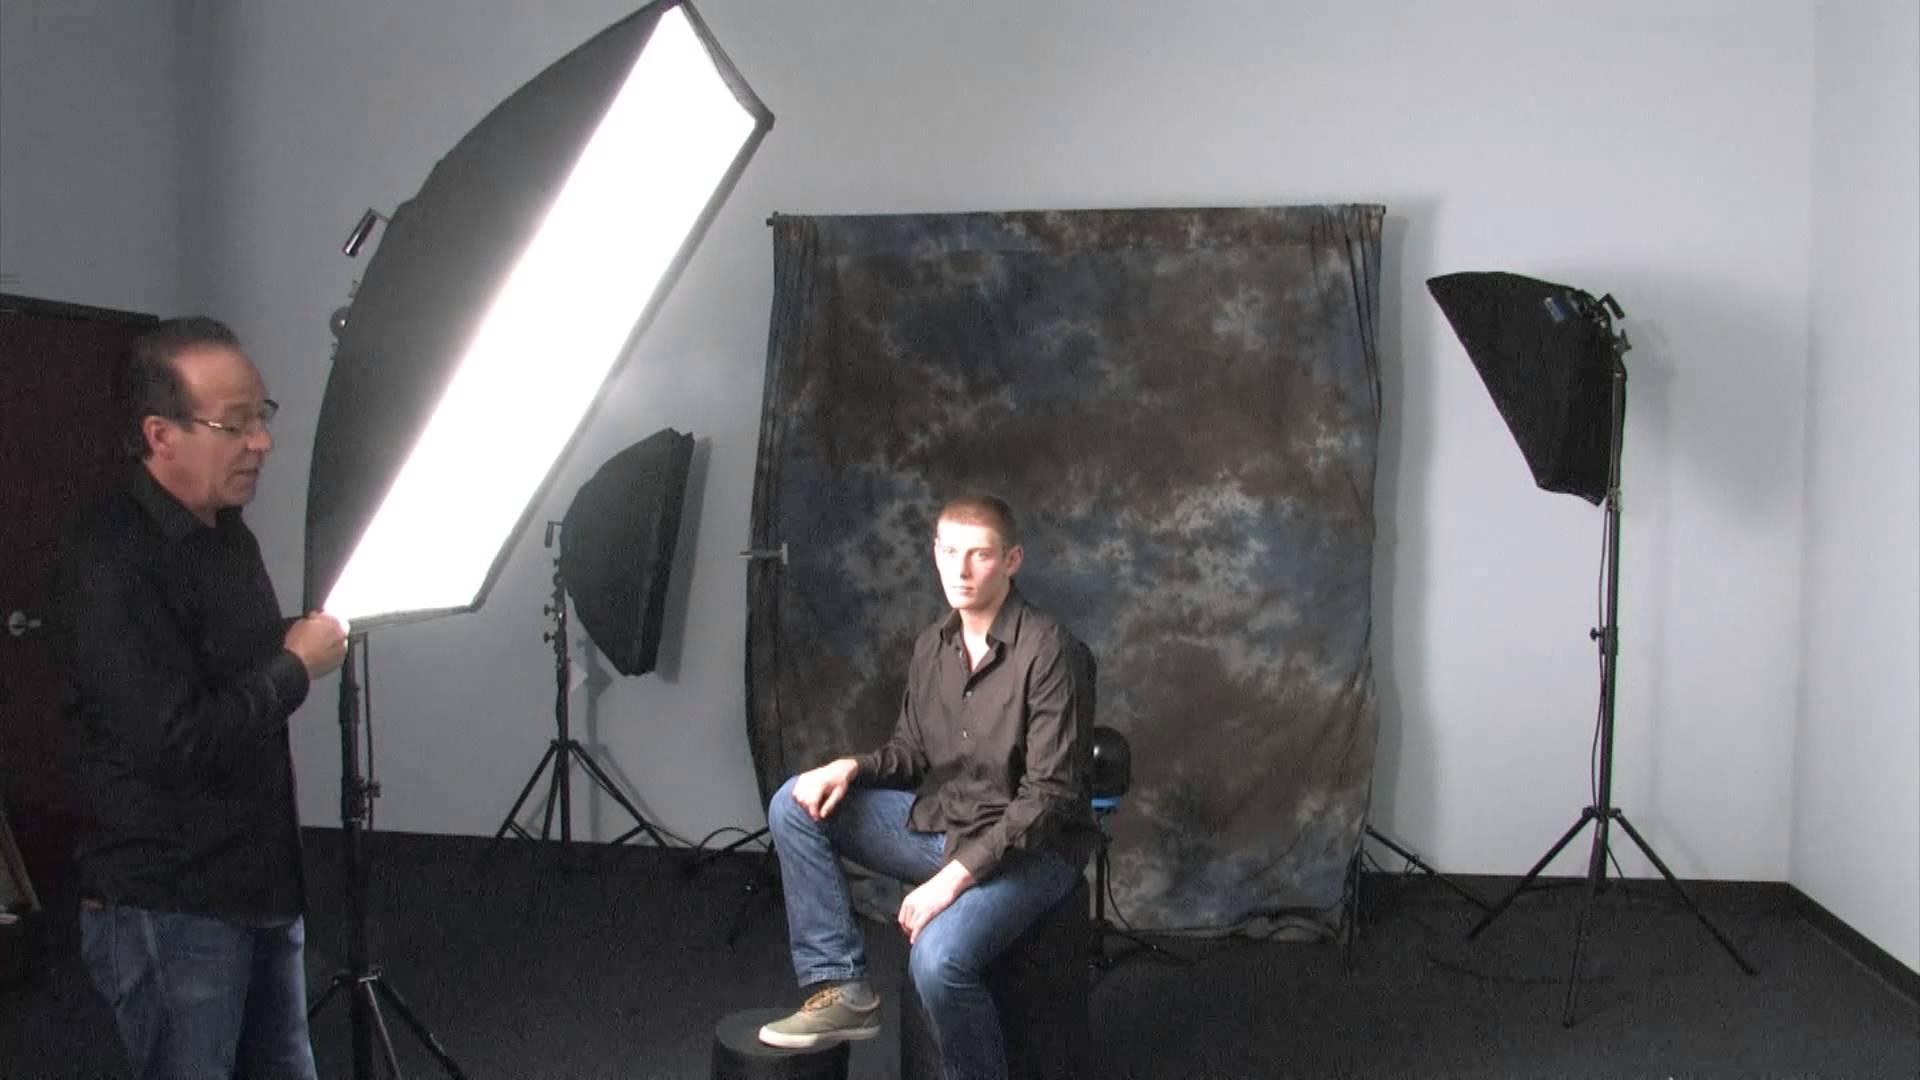 Studio Lighting Fundamentals Part 2 Softboxes & Studio Lighting Fundamentals Part 2: Softboxes u2014 Westcott University azcodes.com